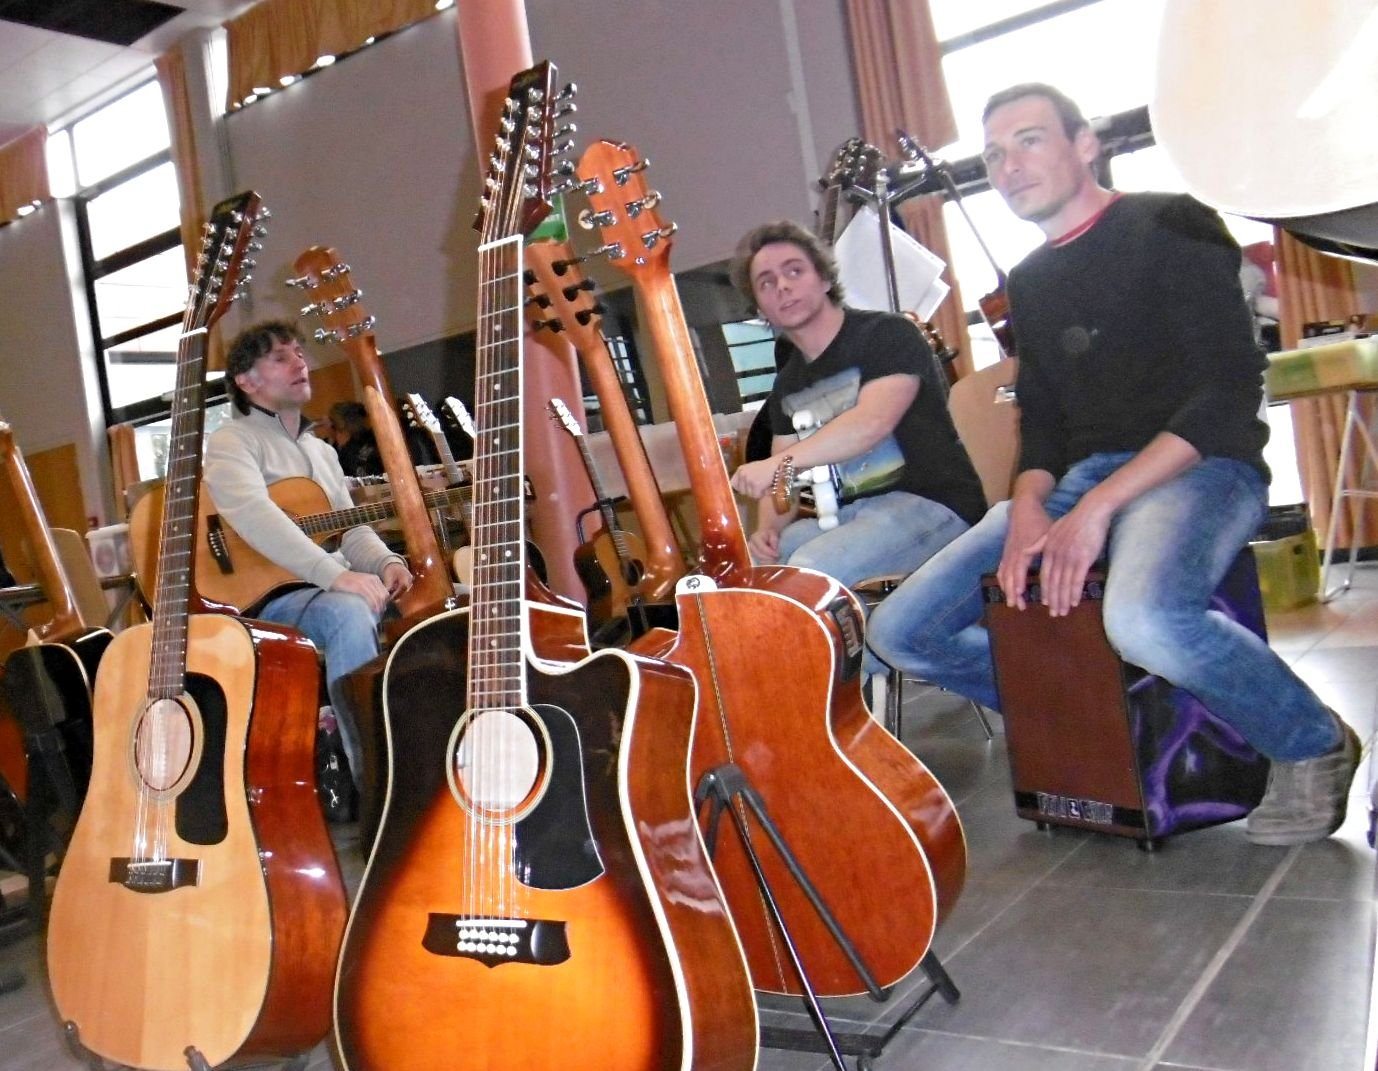 Brocante musicale de Broc en Weppes